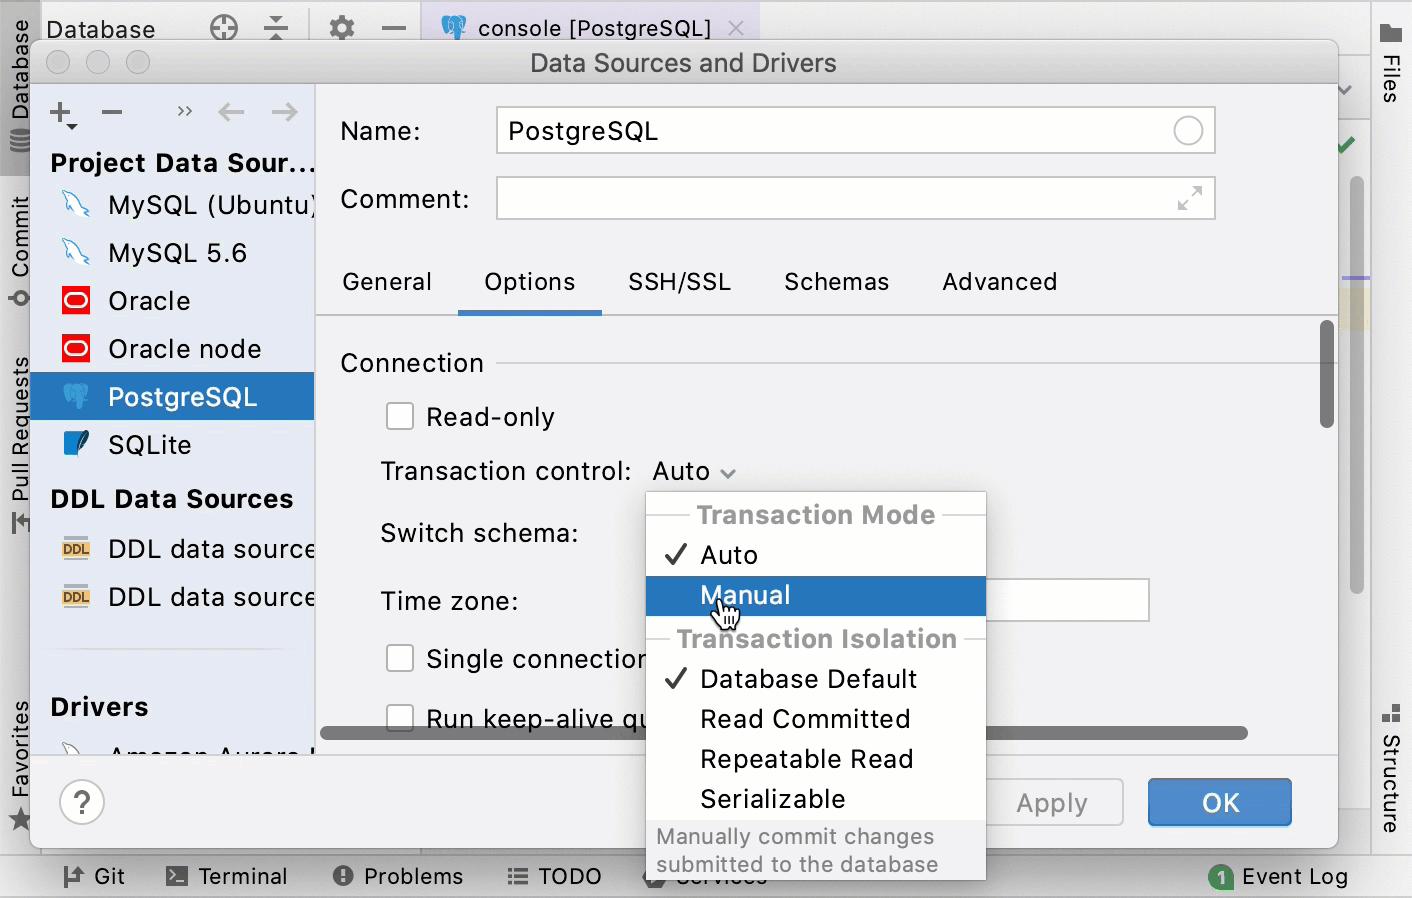 default transaction mode for a data source